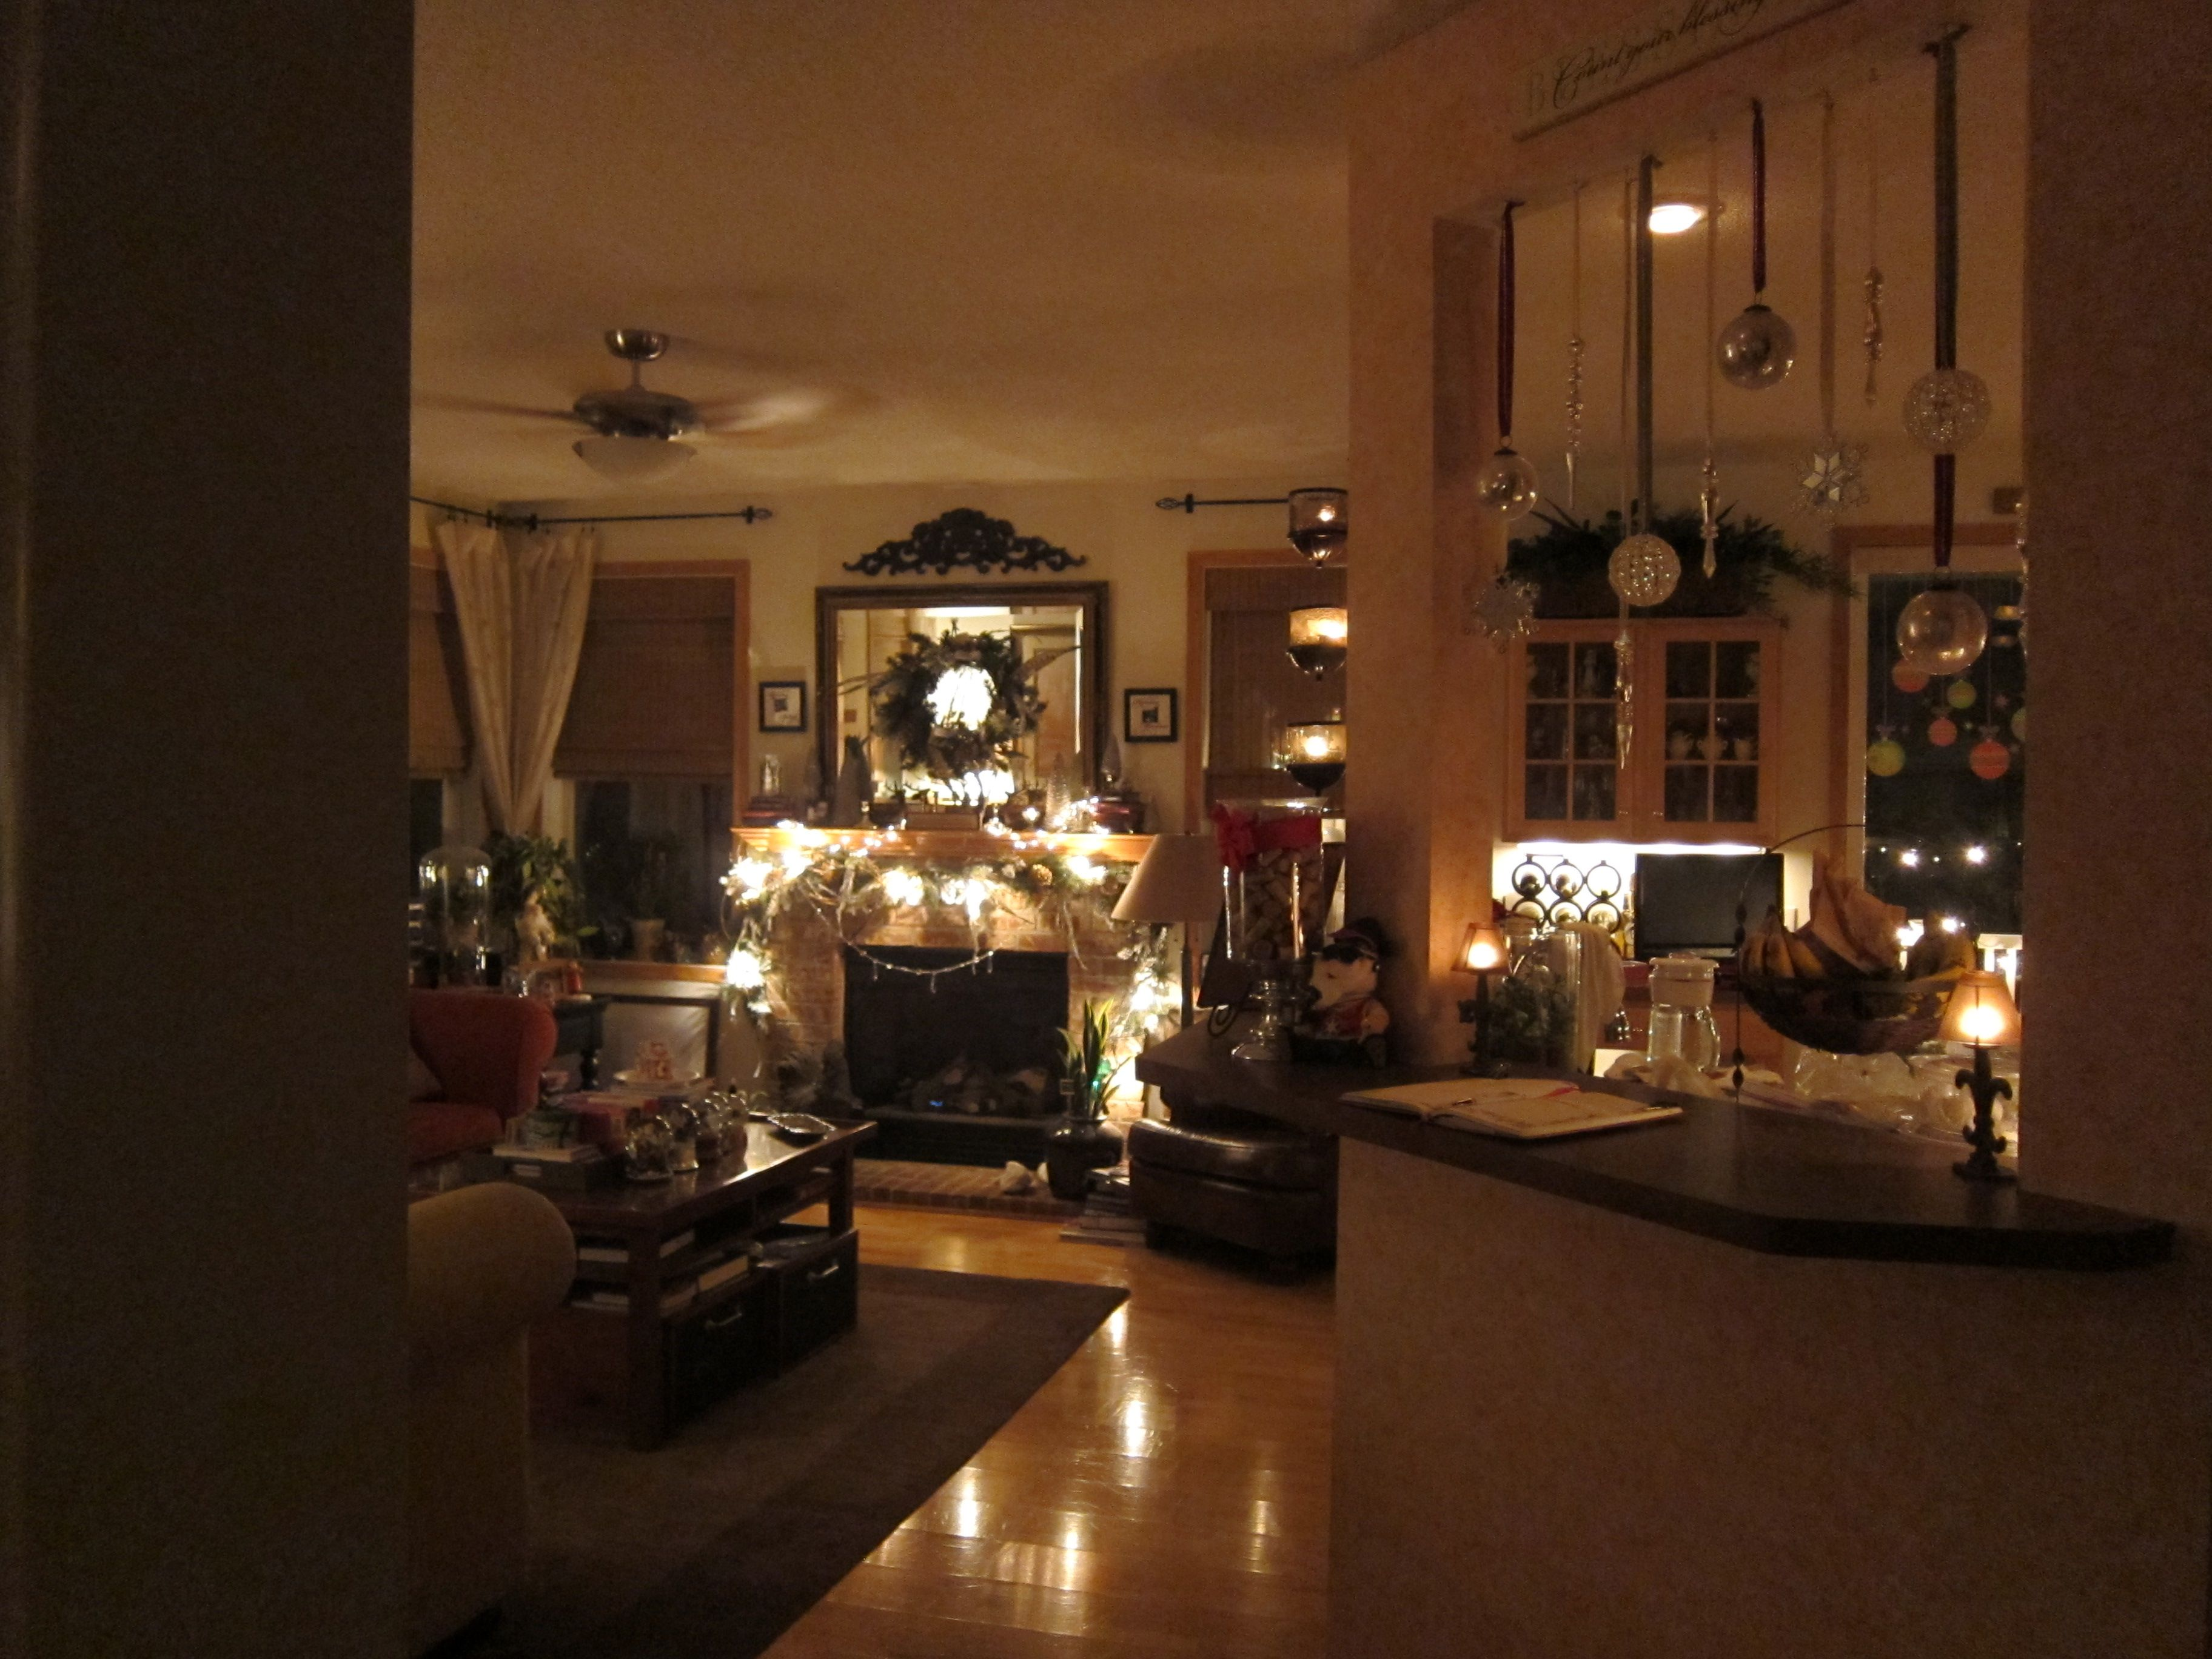 Cozy Christmas Family Room Fireplace Home Stuff